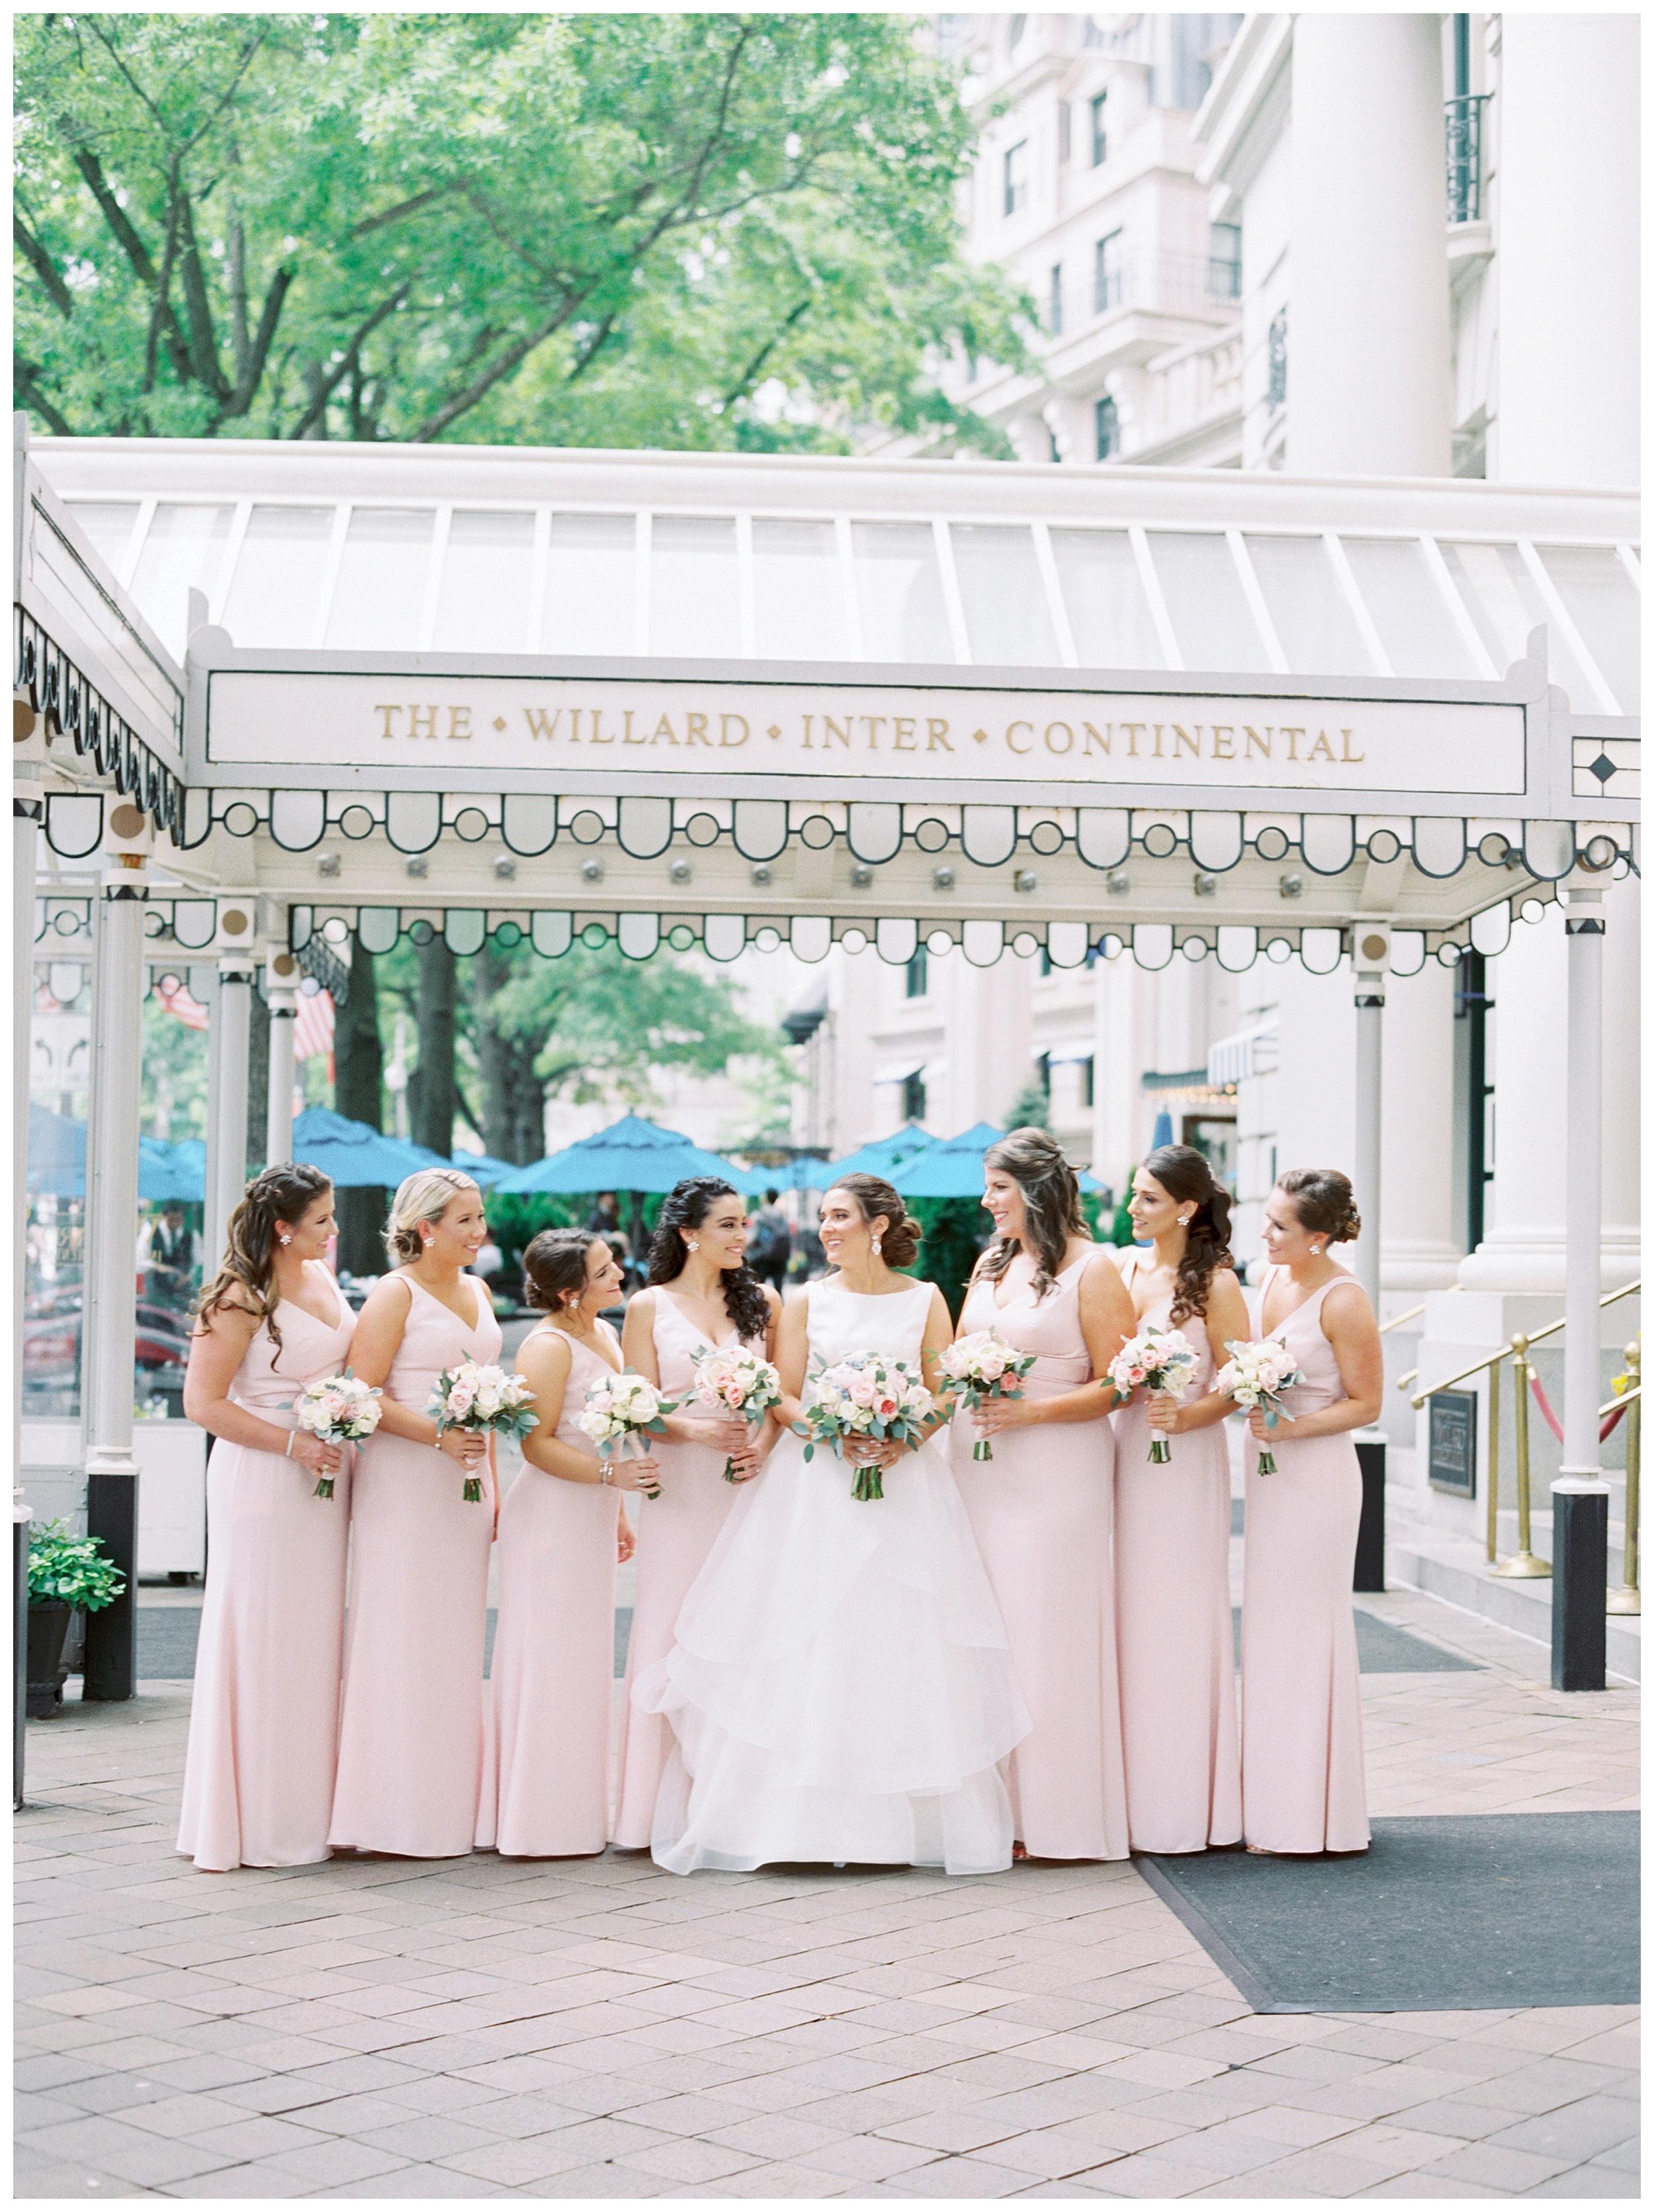 DAR Constitution Hall Wedding Wedding | Daughters of the American Revolution Wedding | District of Columbia Film Wedding Photographer Kir Tuben_0043.jpg